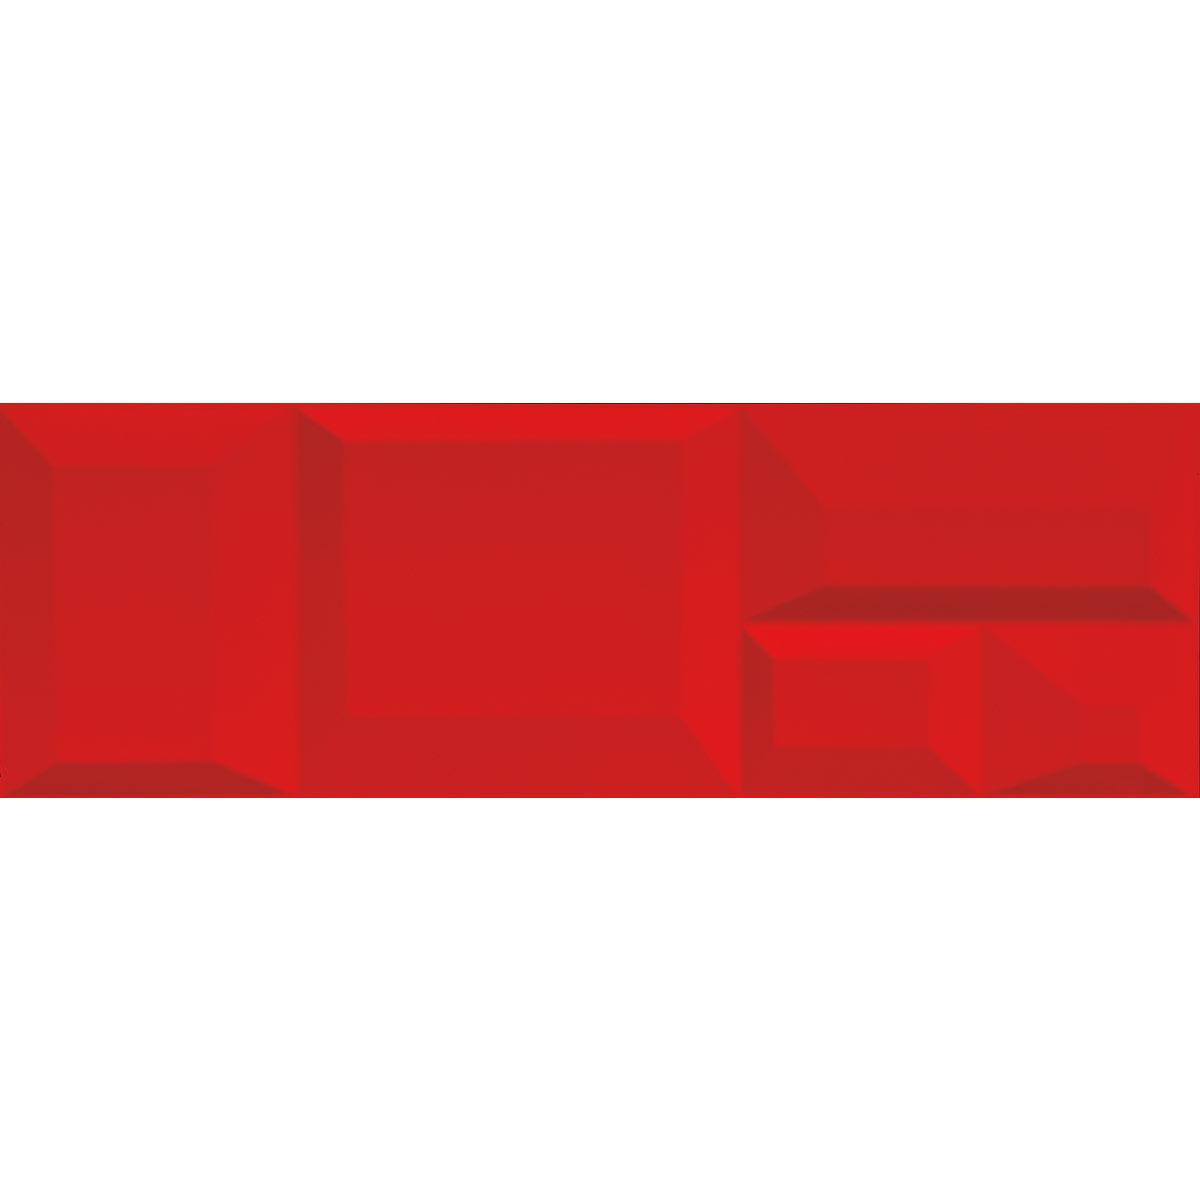 D00250 NORDIC RED CAPTURE